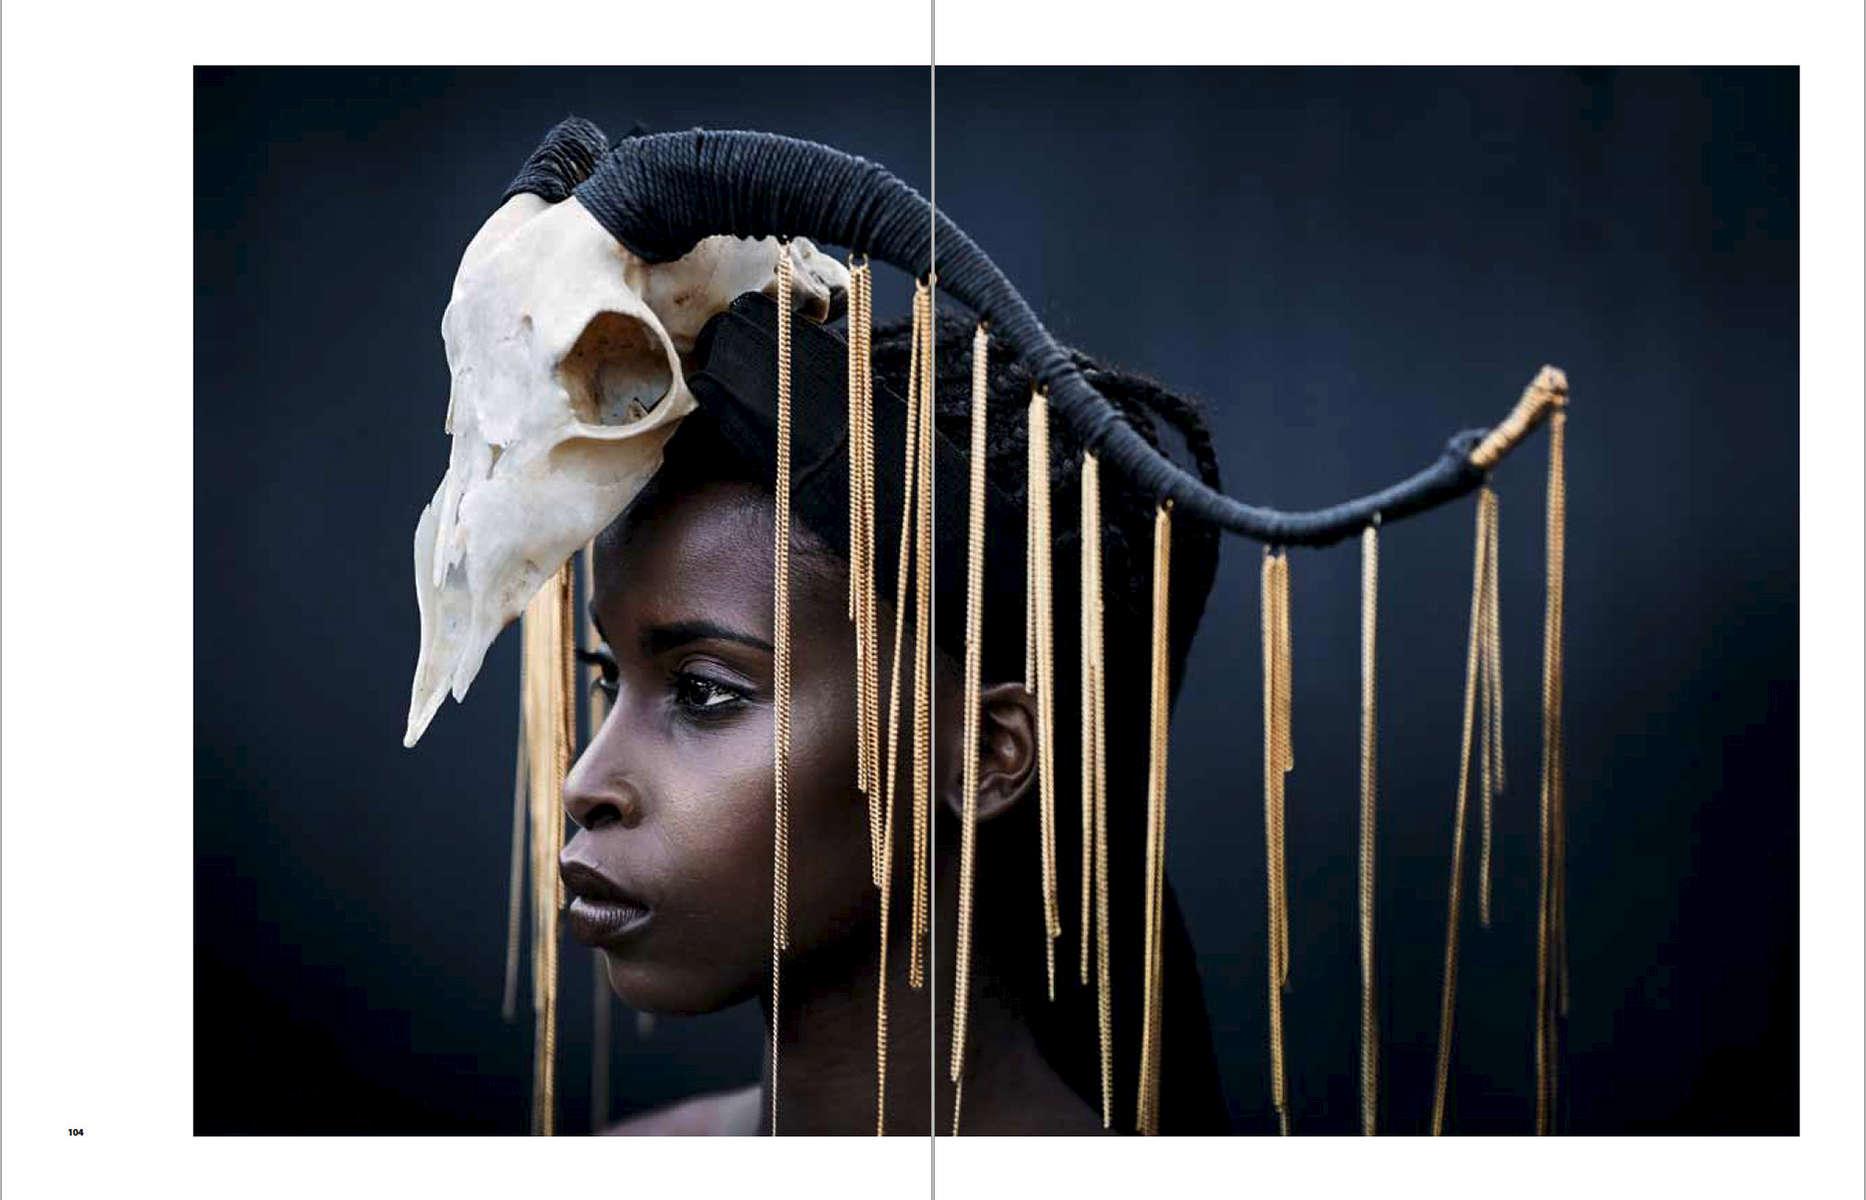 African_Catwalk_013